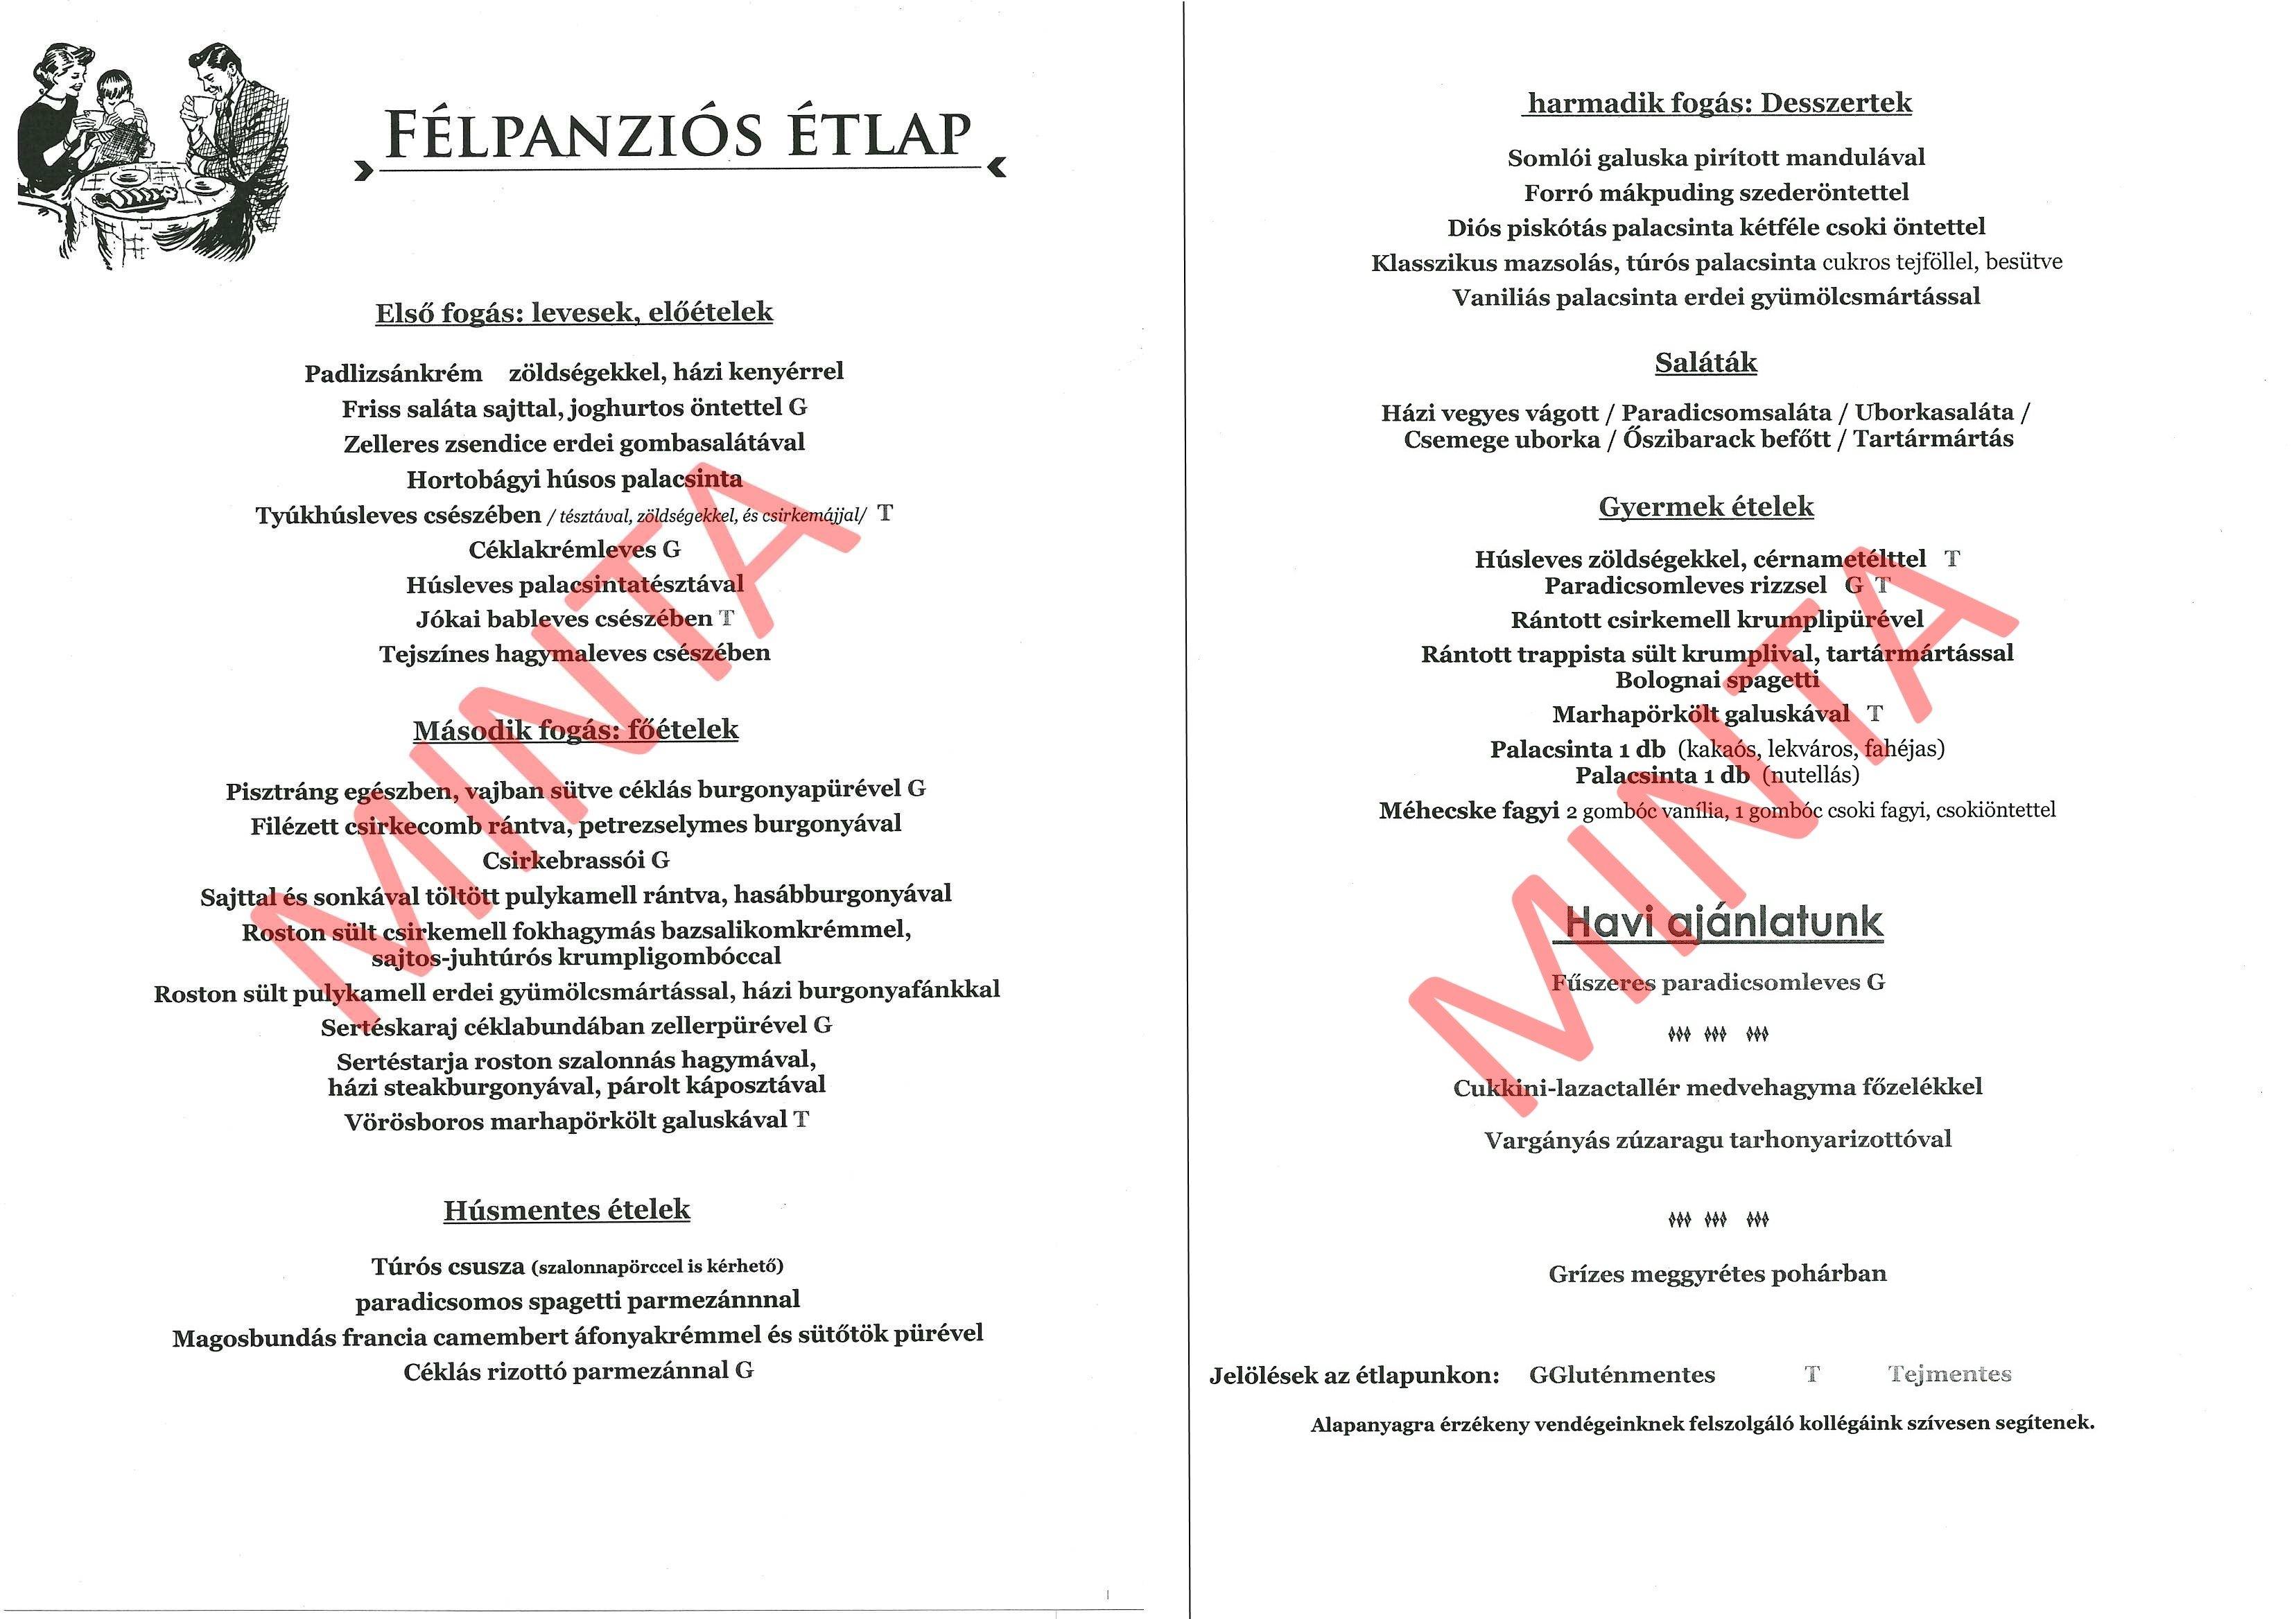 felpanzios1-2old